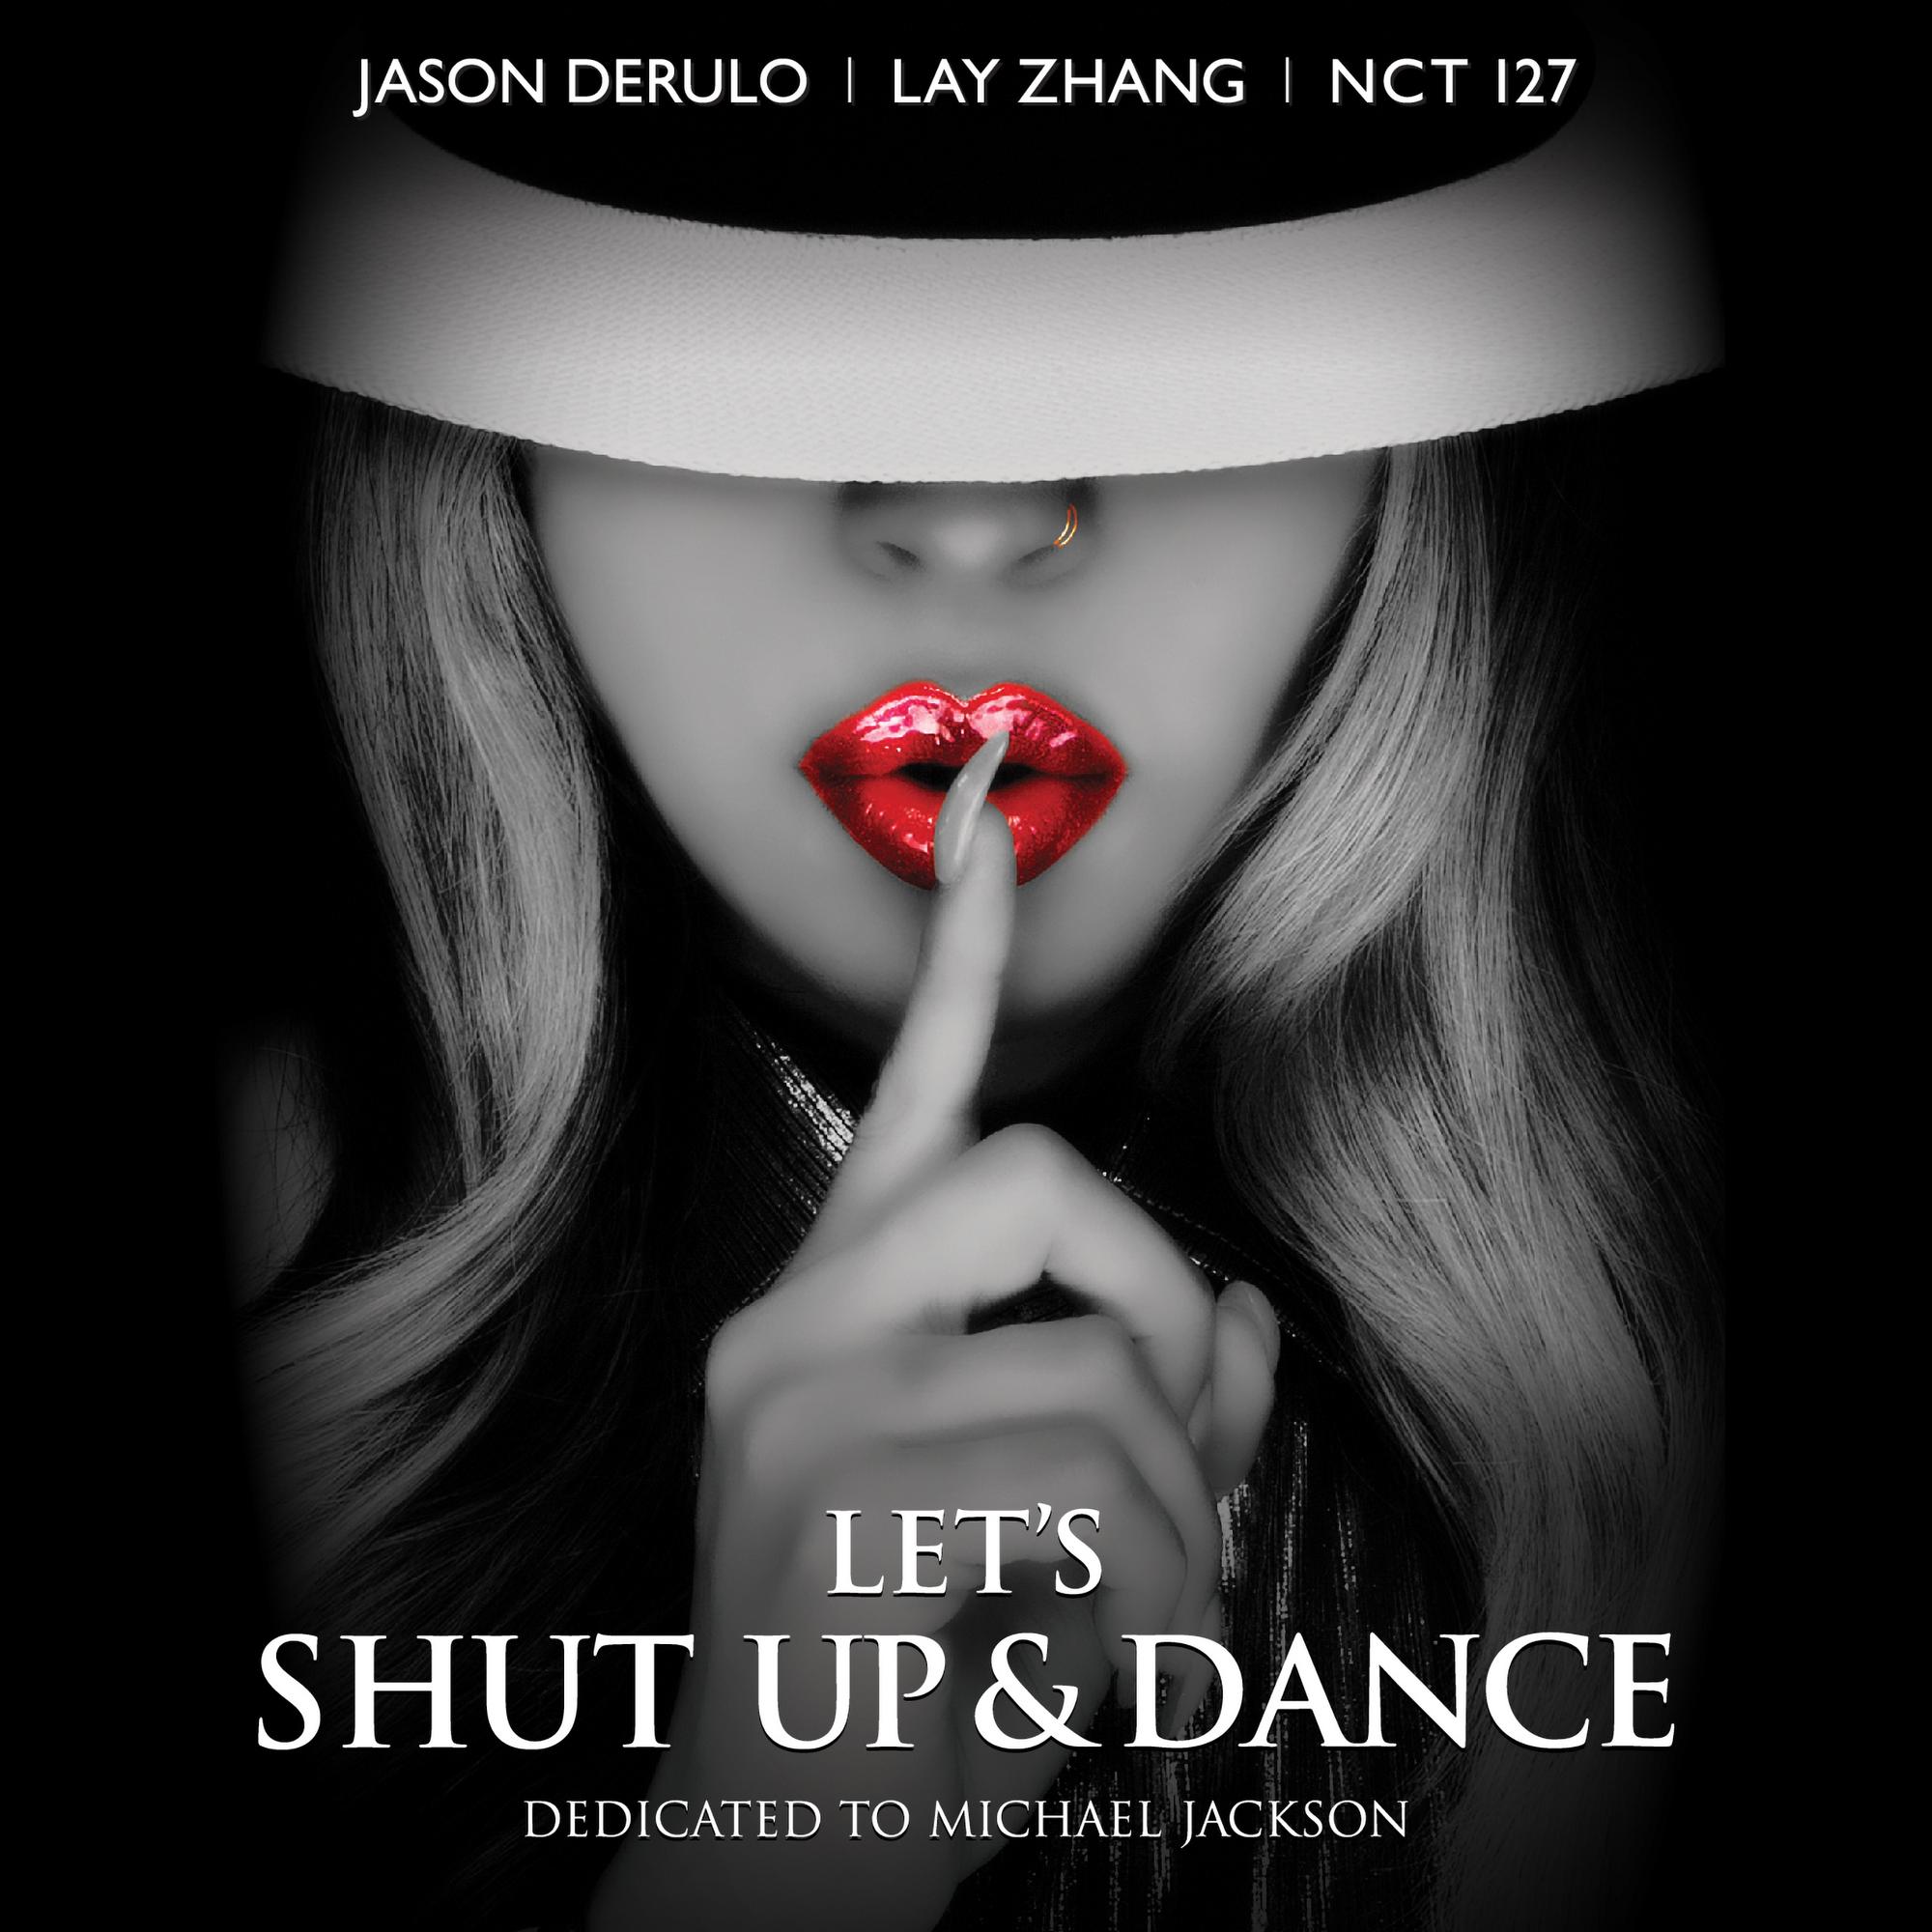 Let's Shut Up & Dance | Kpop Wiki | FANDOM powered by Wikia